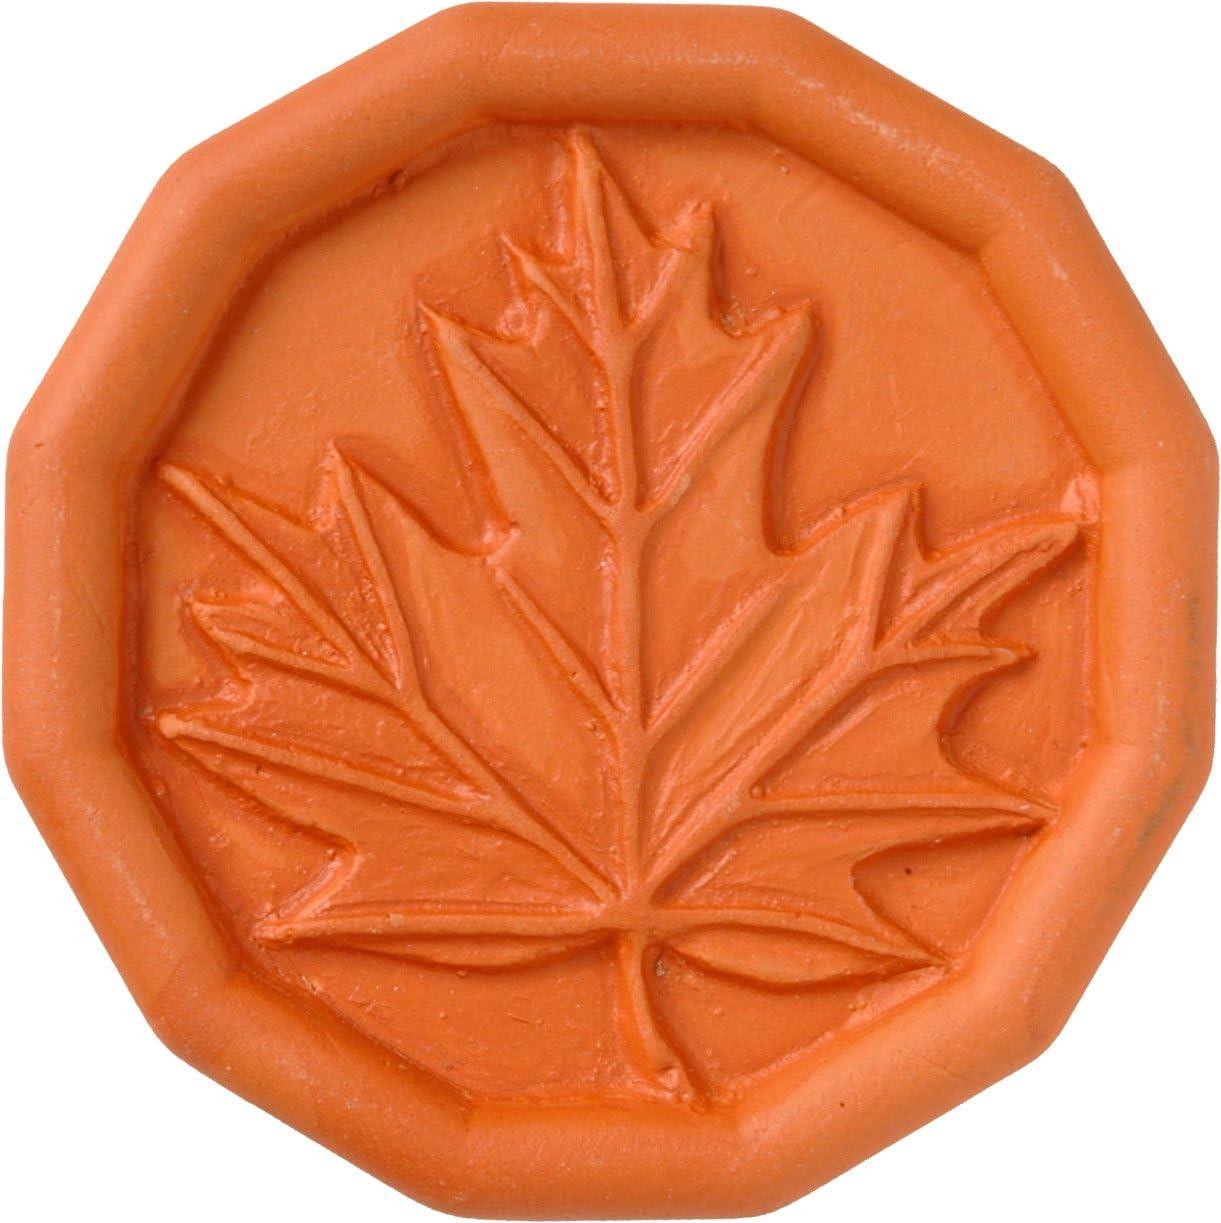 JBK Maple Leaf Terra Cotta Brown Sugar Saver